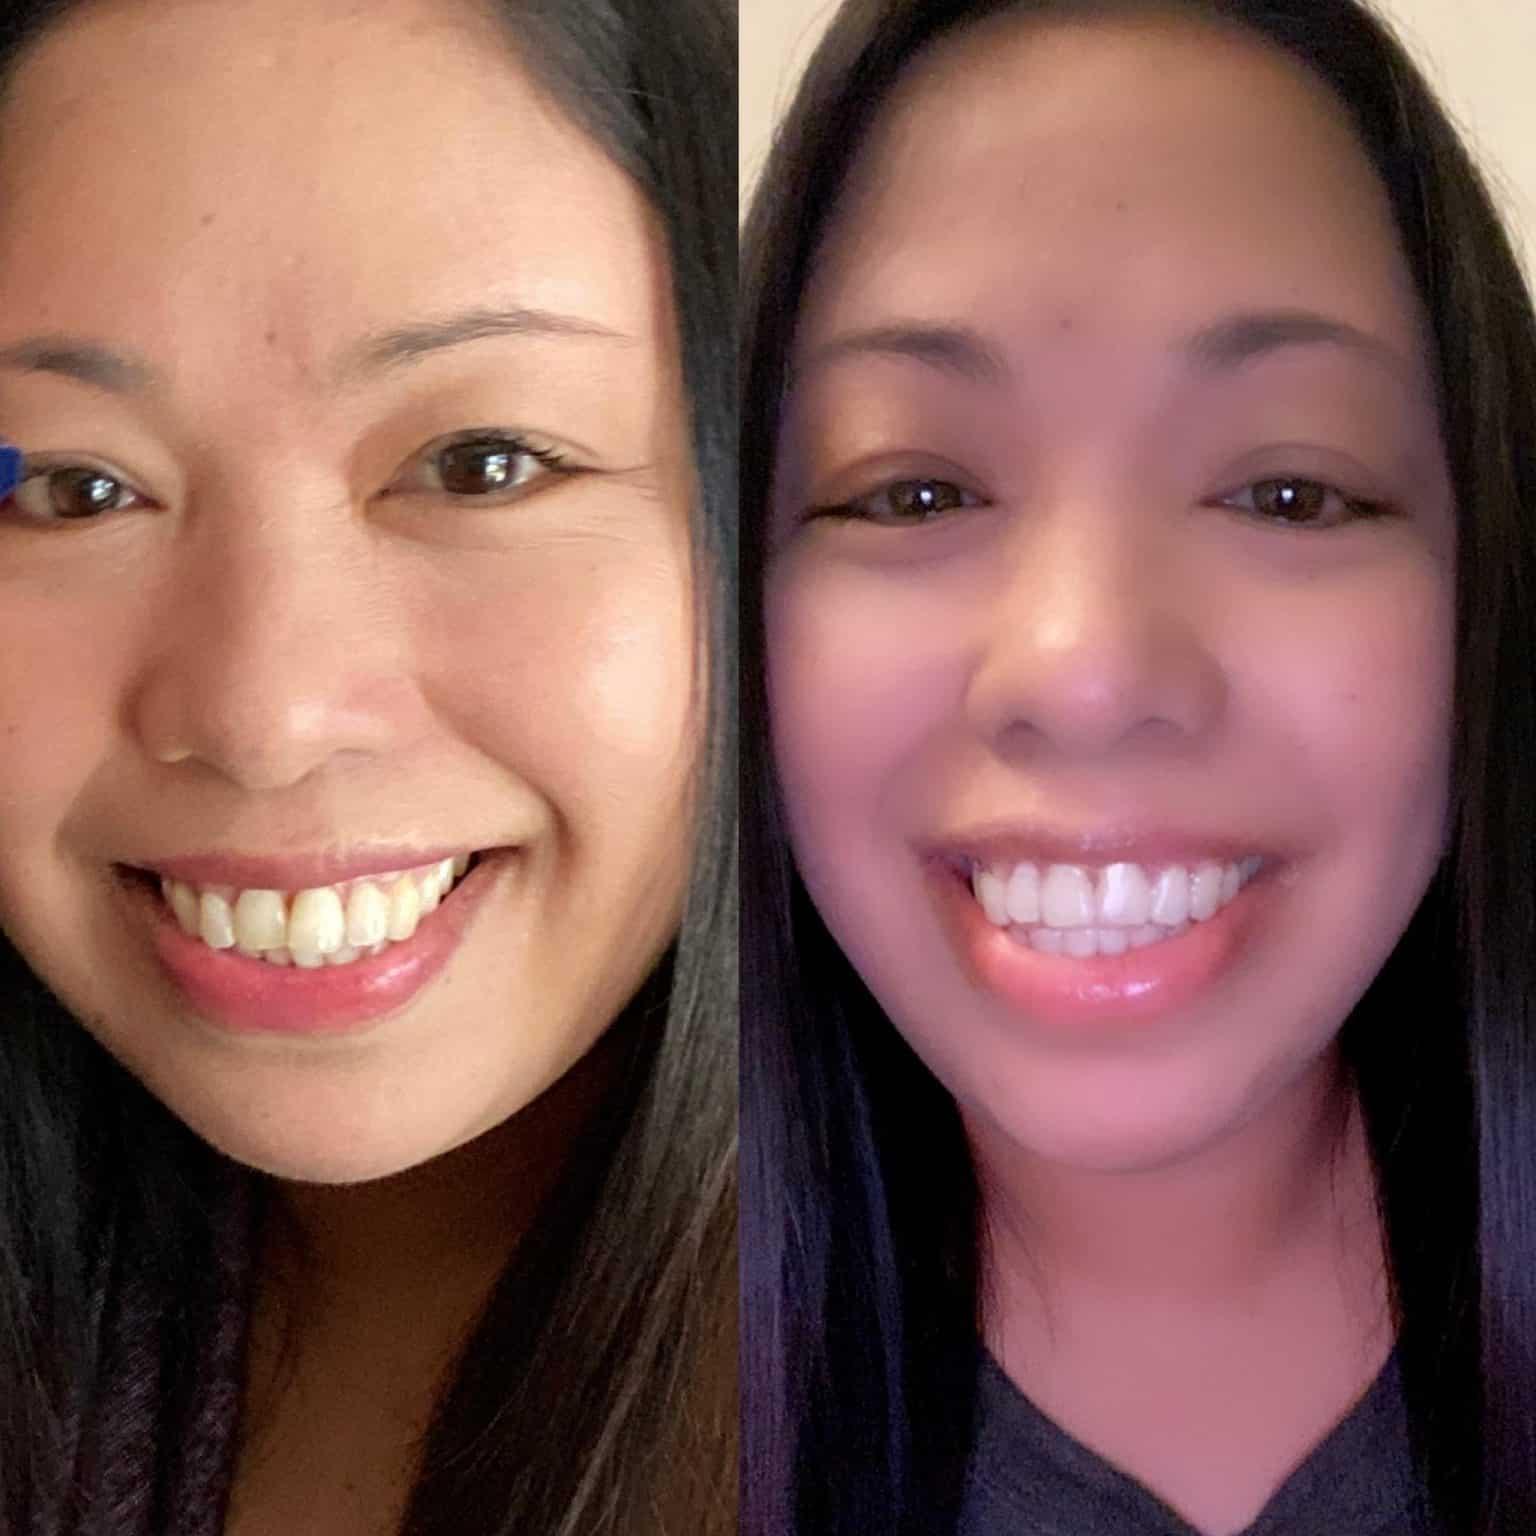 Boosting self-confidence-teeth align